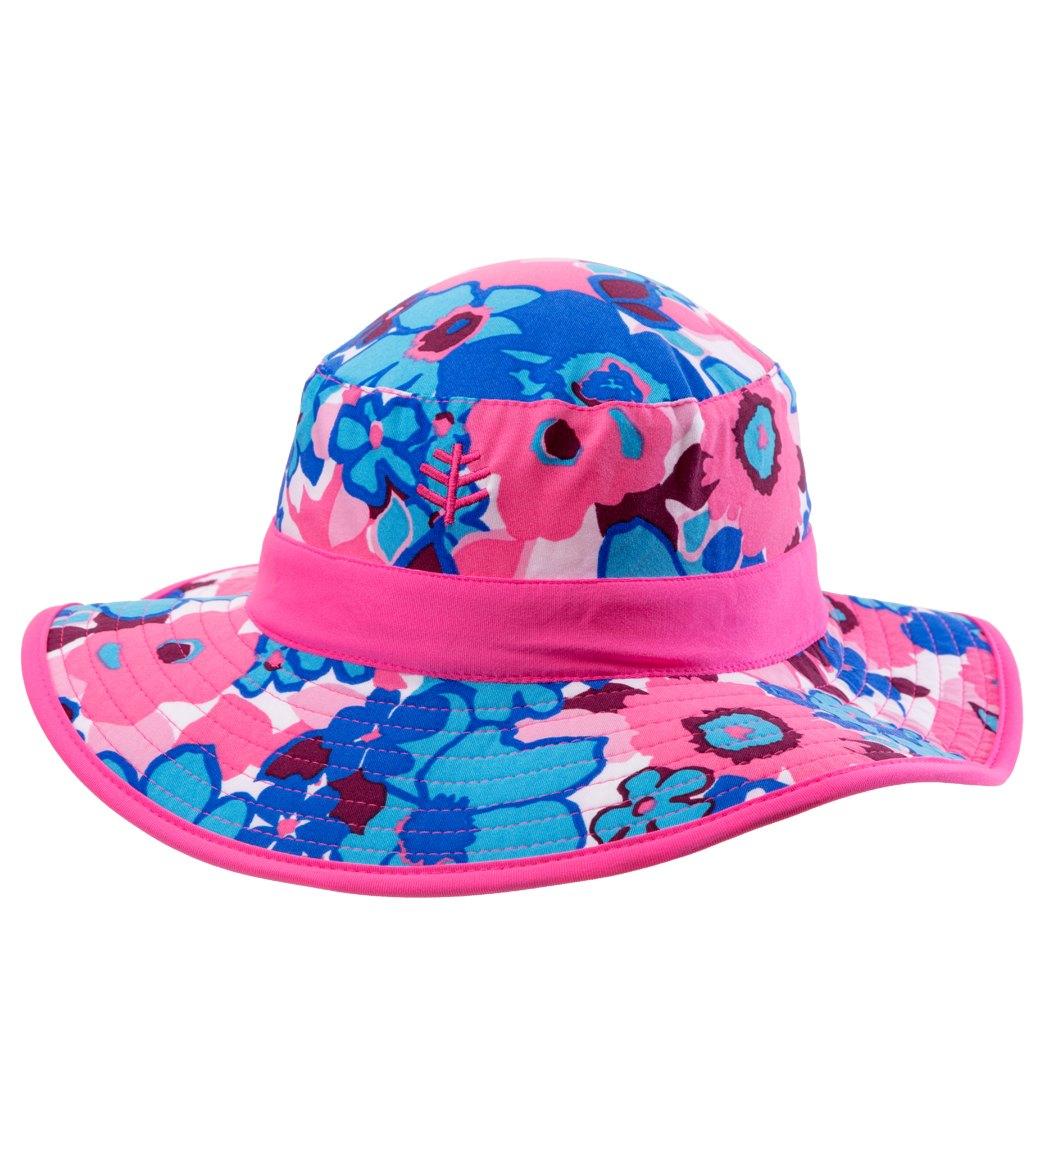 80581c9e9d41f Coolibar Kids  UPF 50+ Reversible Surf Bucket Hat at SwimOutlet.com